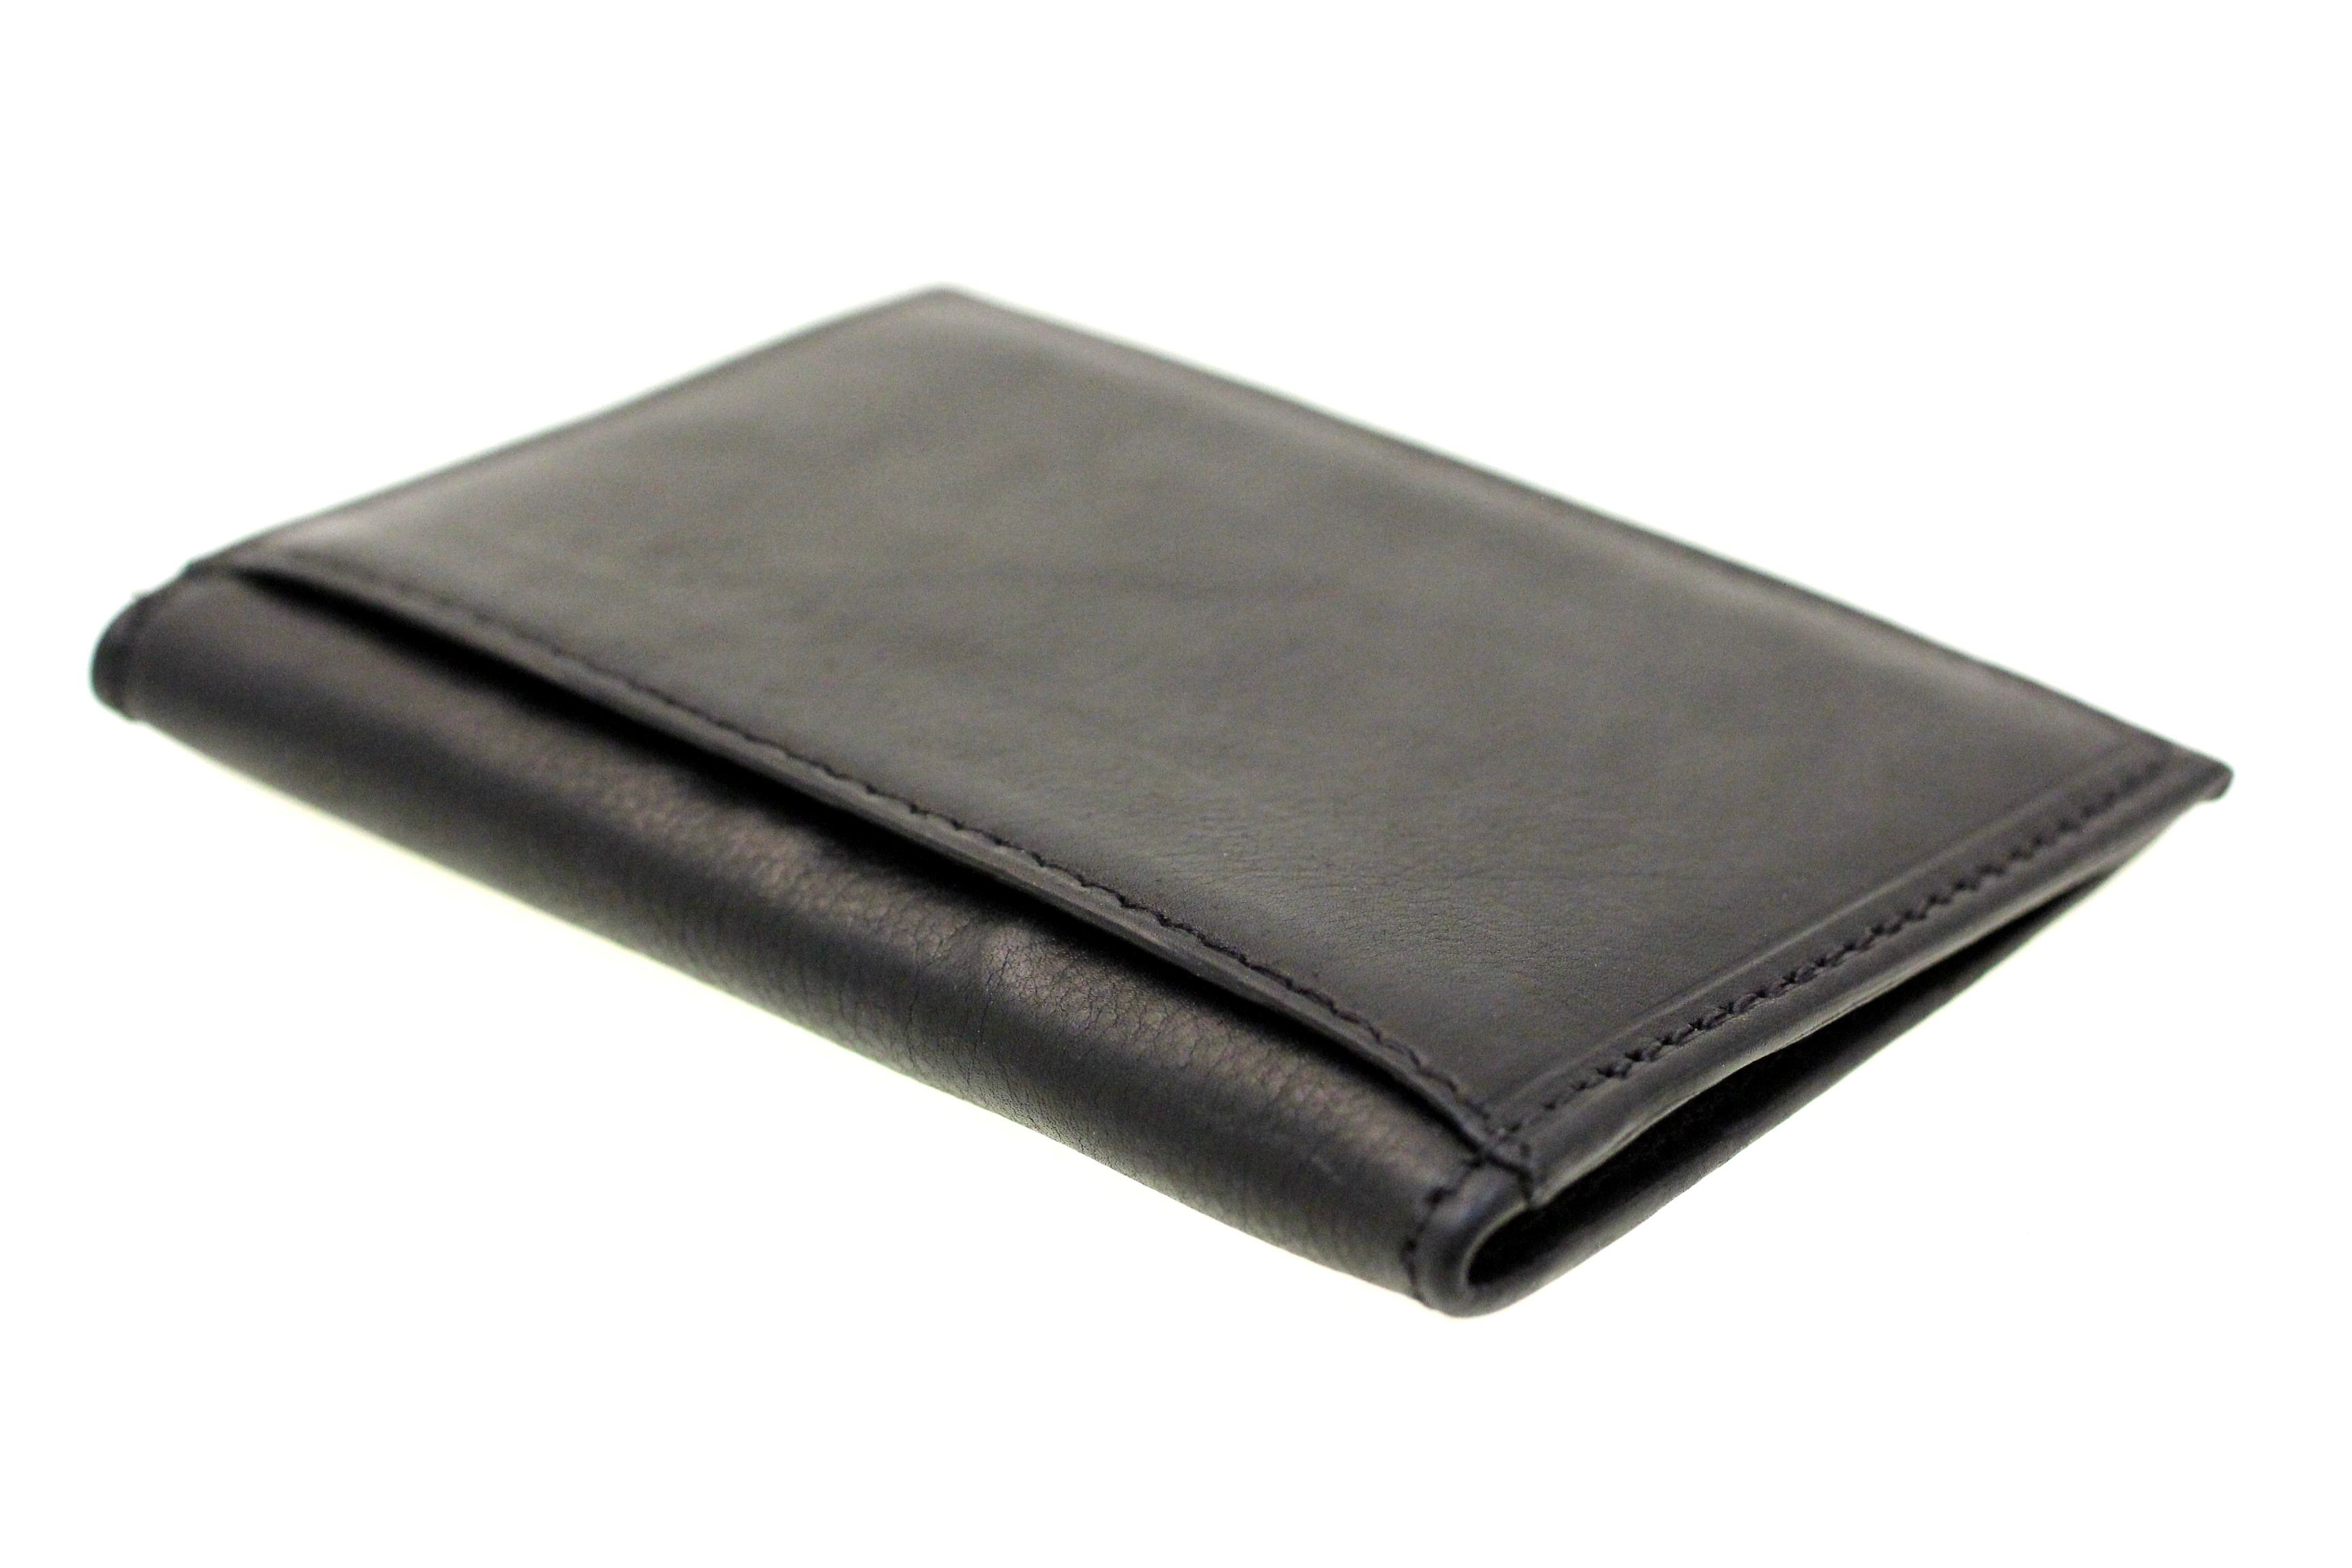 Credit Card Holder Case Genuine Leather Men Women Slim ...